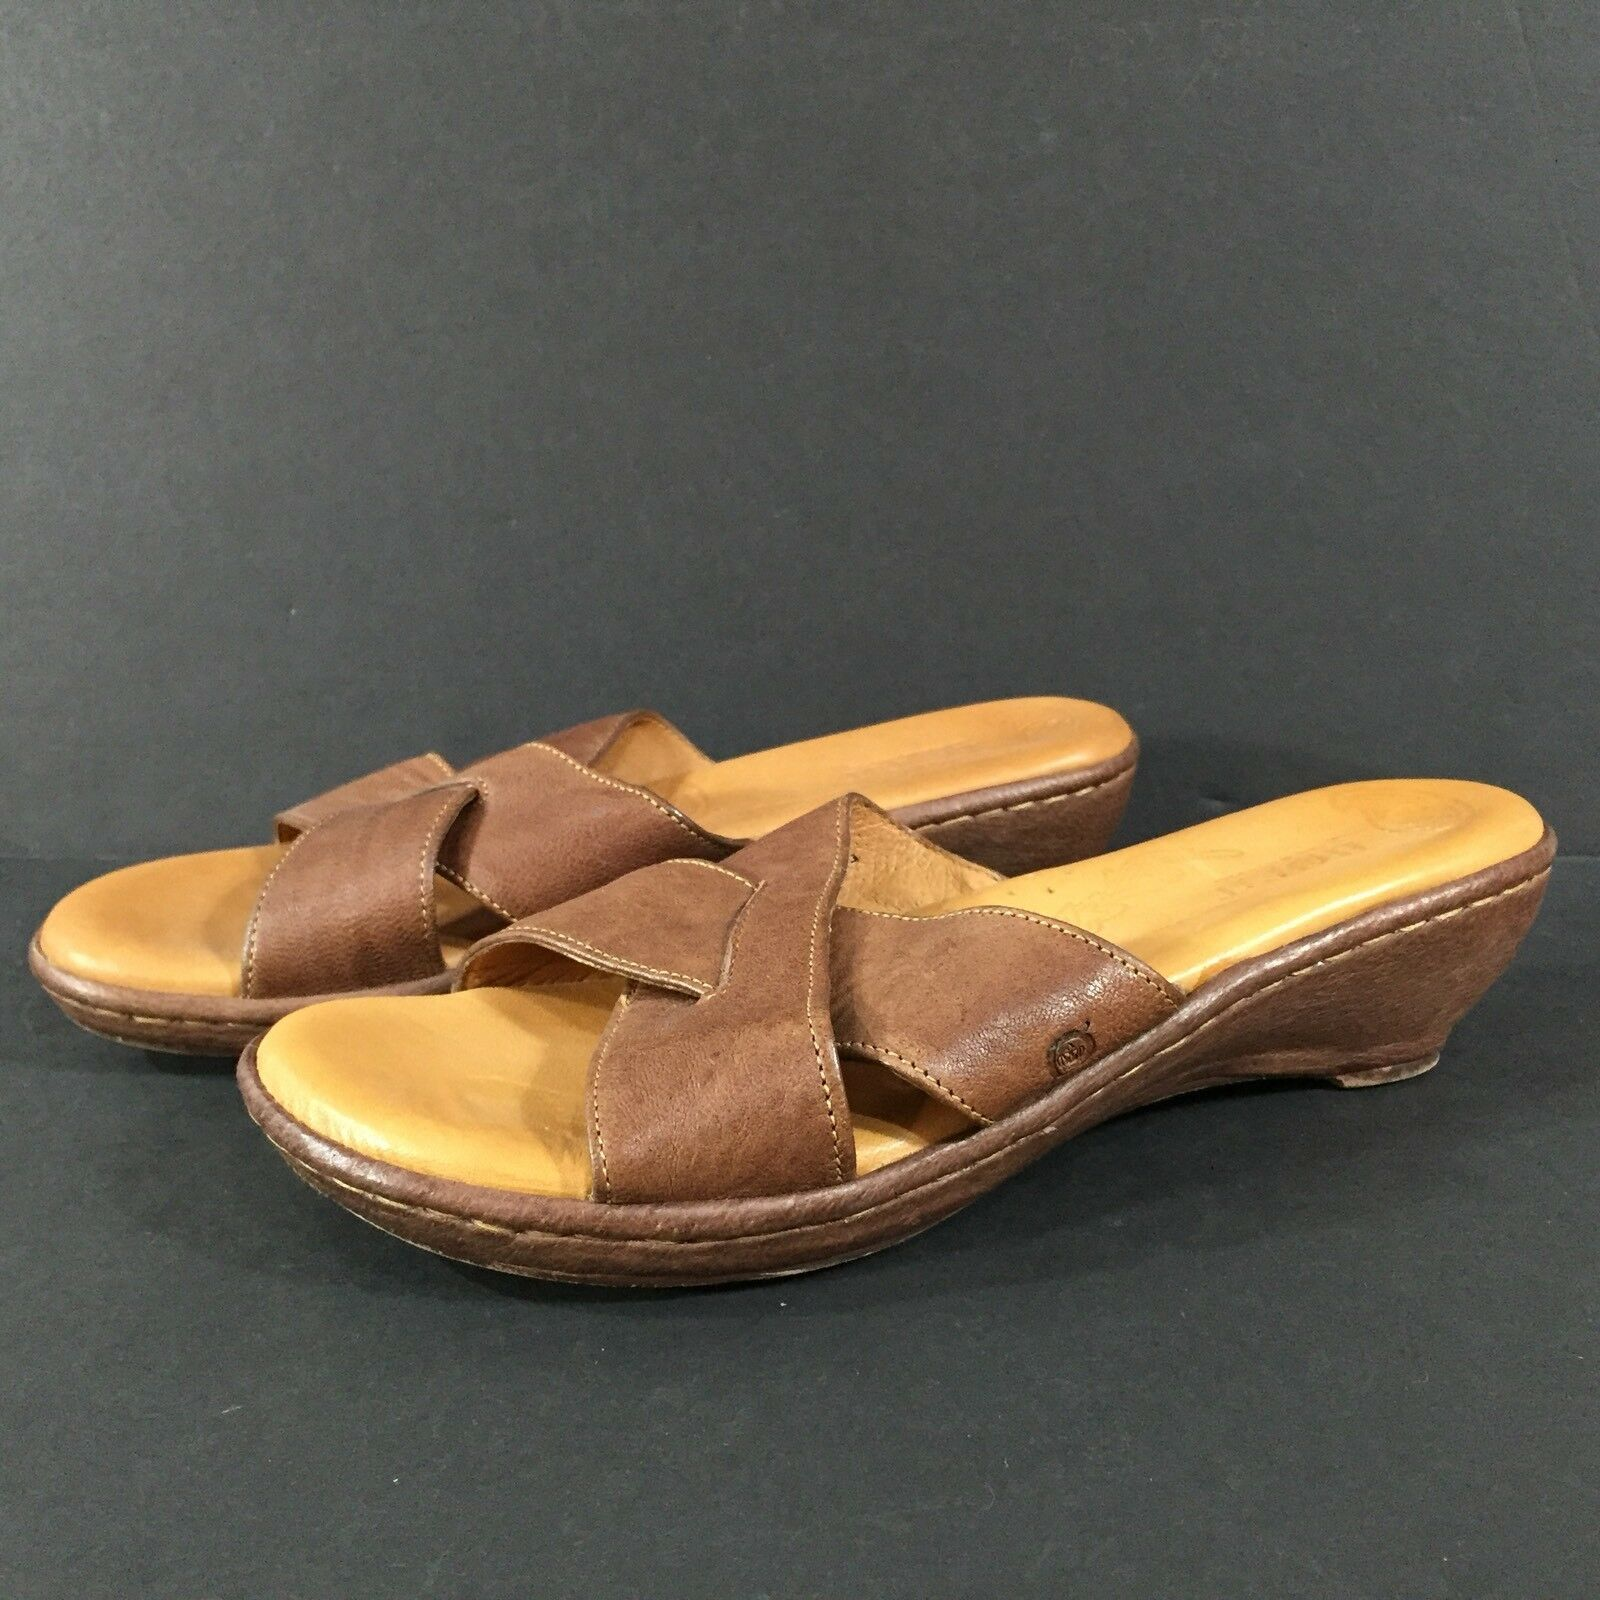 Womens BORN Brown Leather Slides Mules Sandals US 7 M   VGC